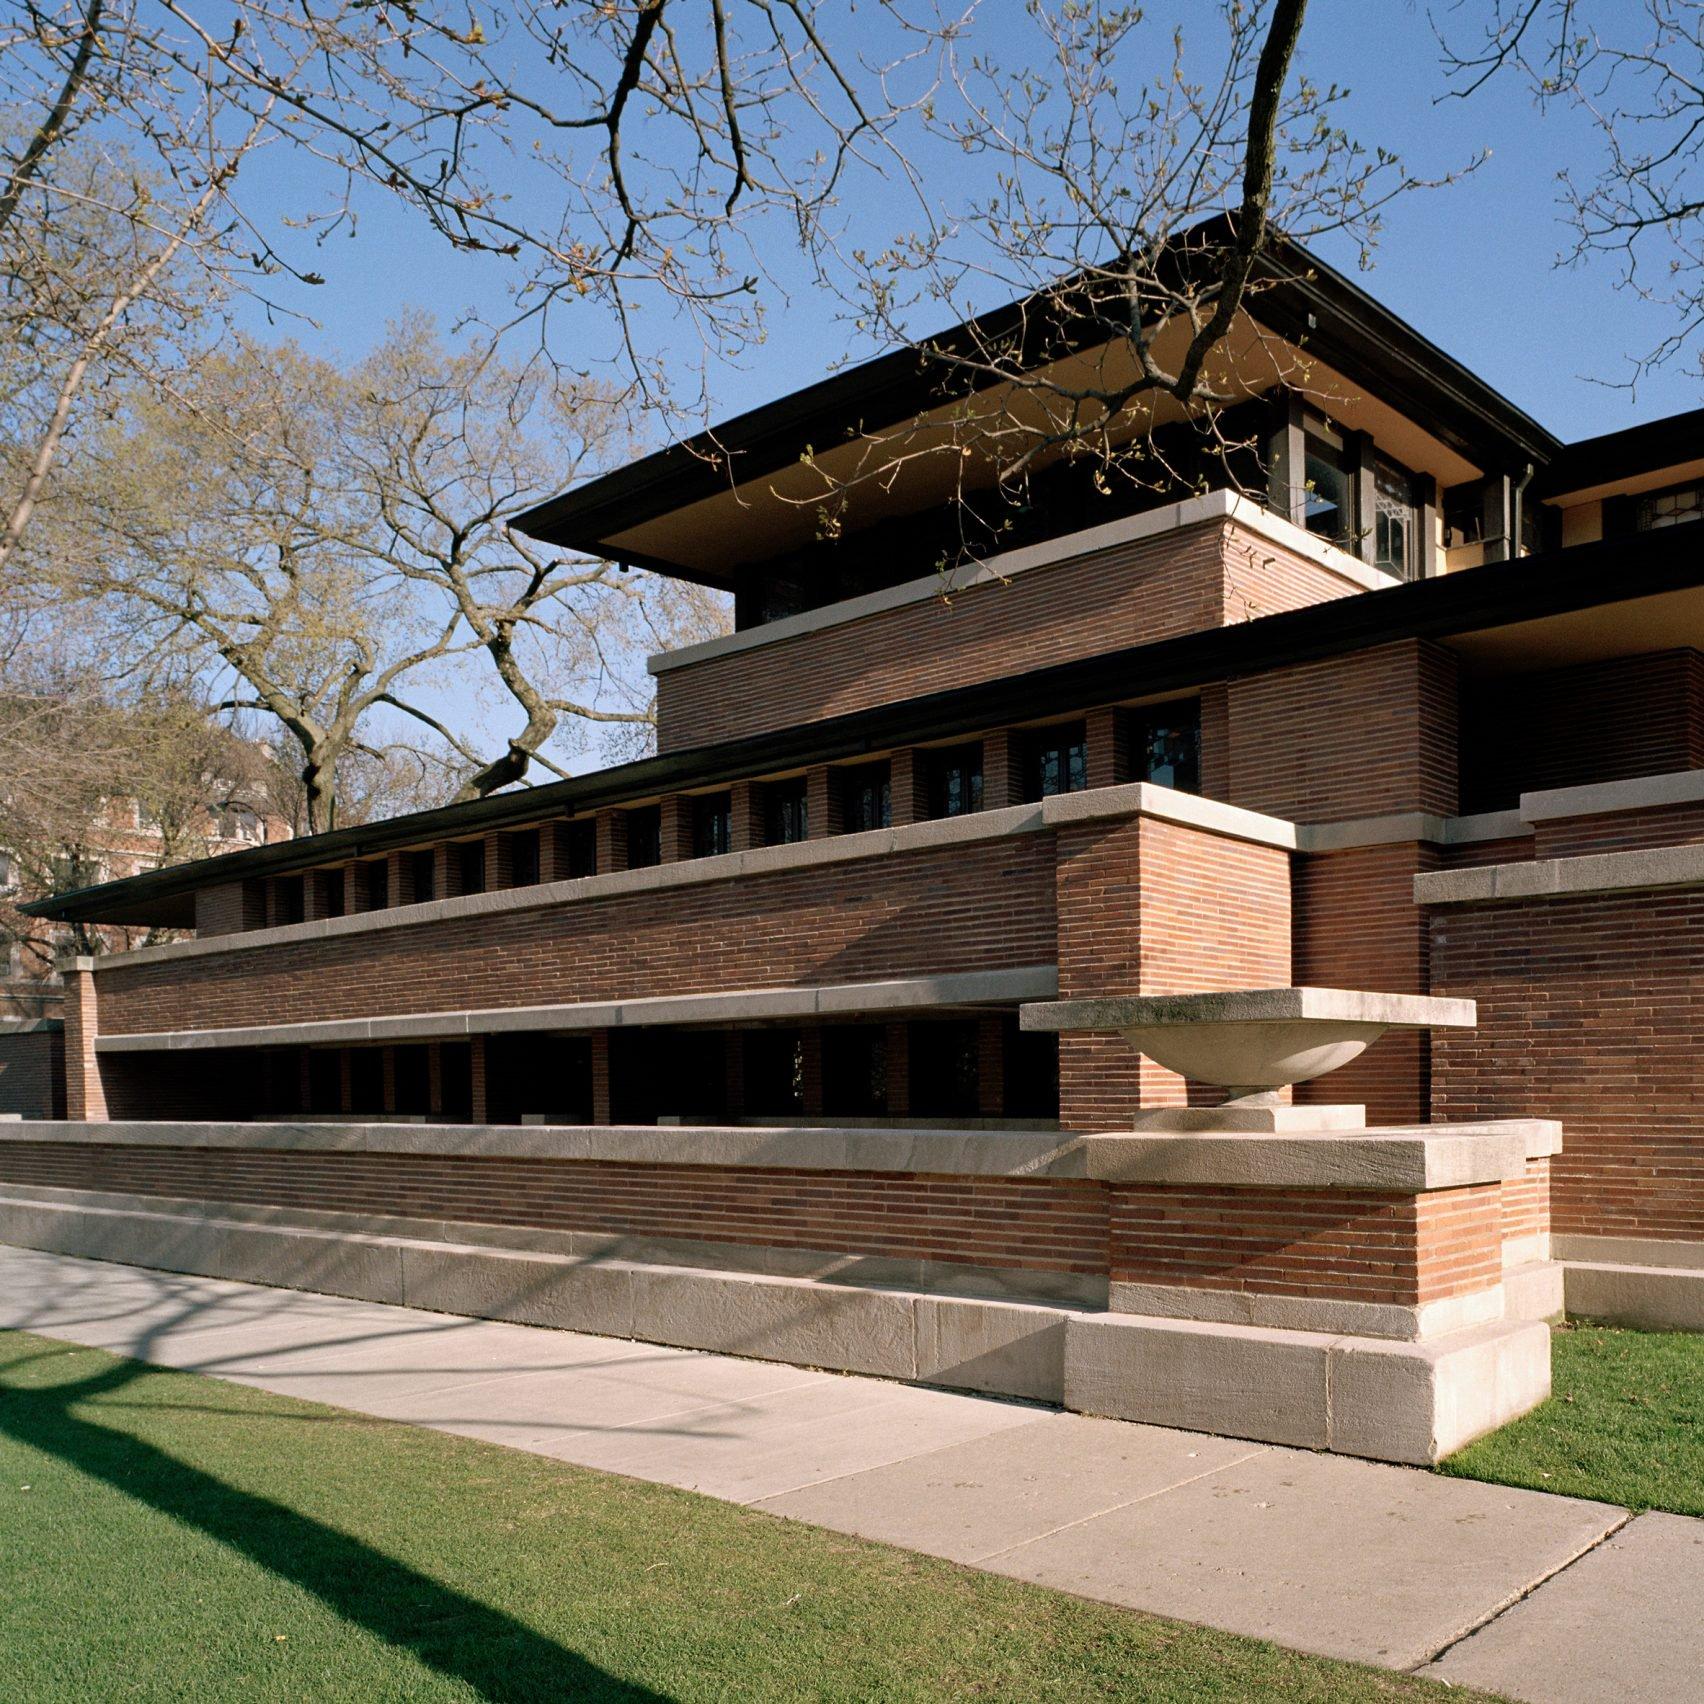 """Frank Lloyd Wright remains America's greatest architect"""